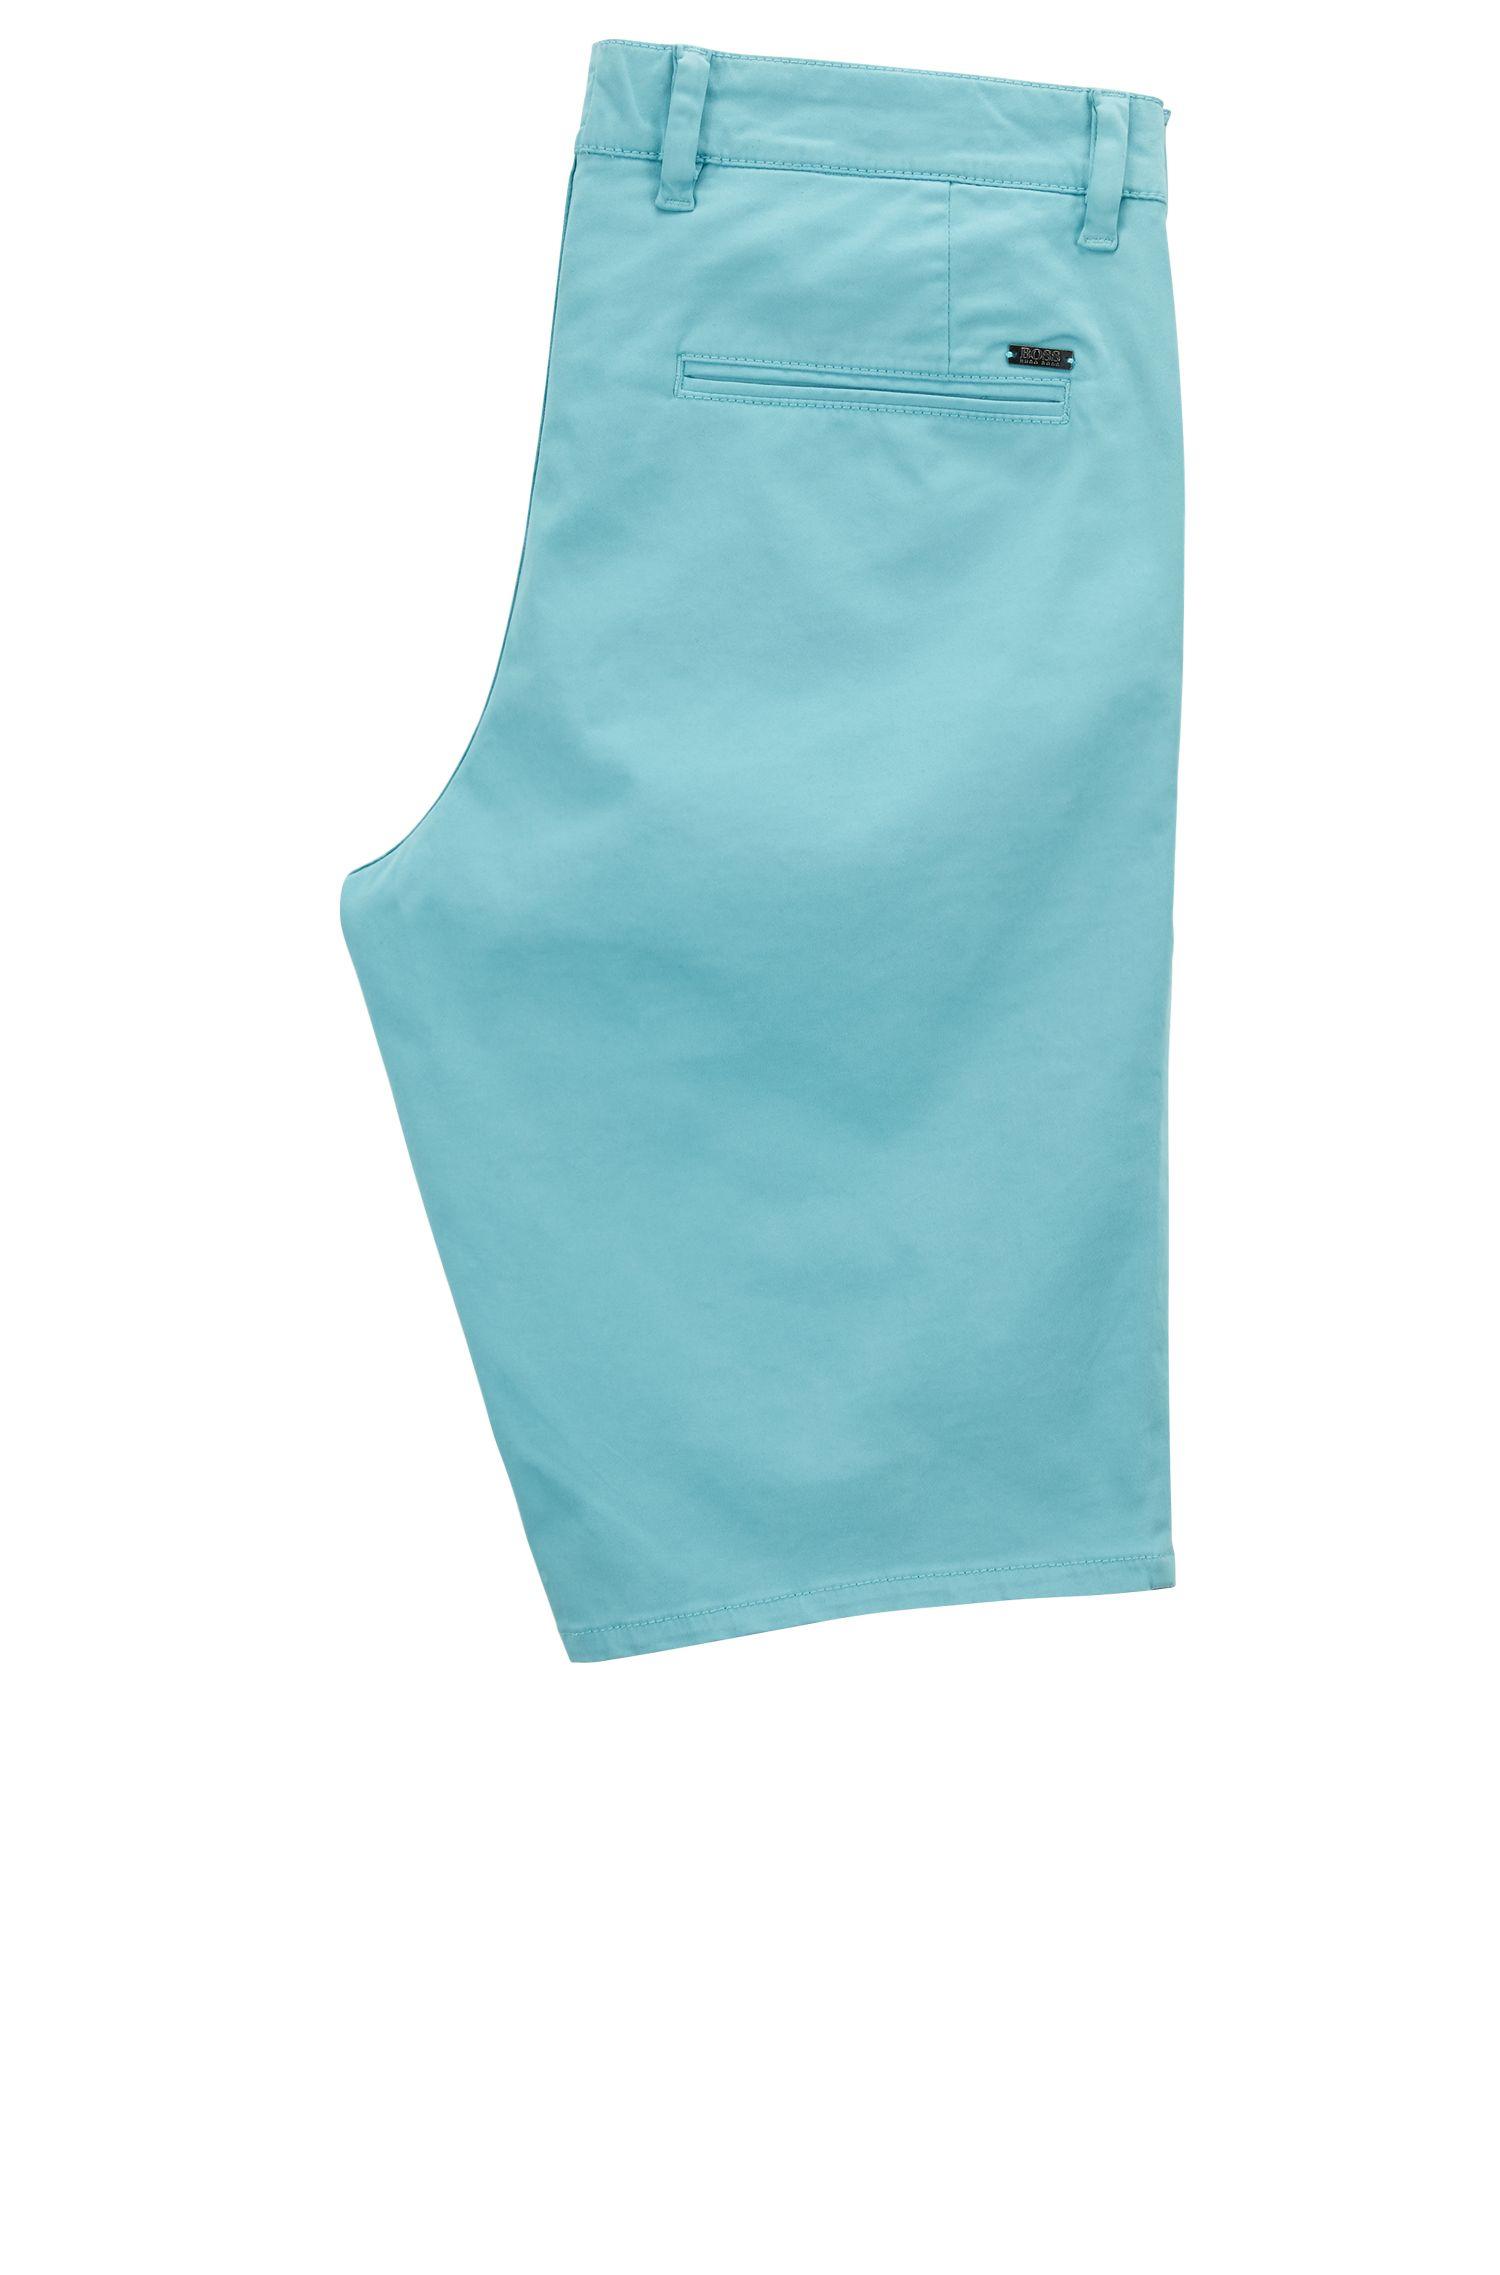 Stretch Cotton Chino Short, Slim Fit | Schino Slim Shorts D, Turquoise